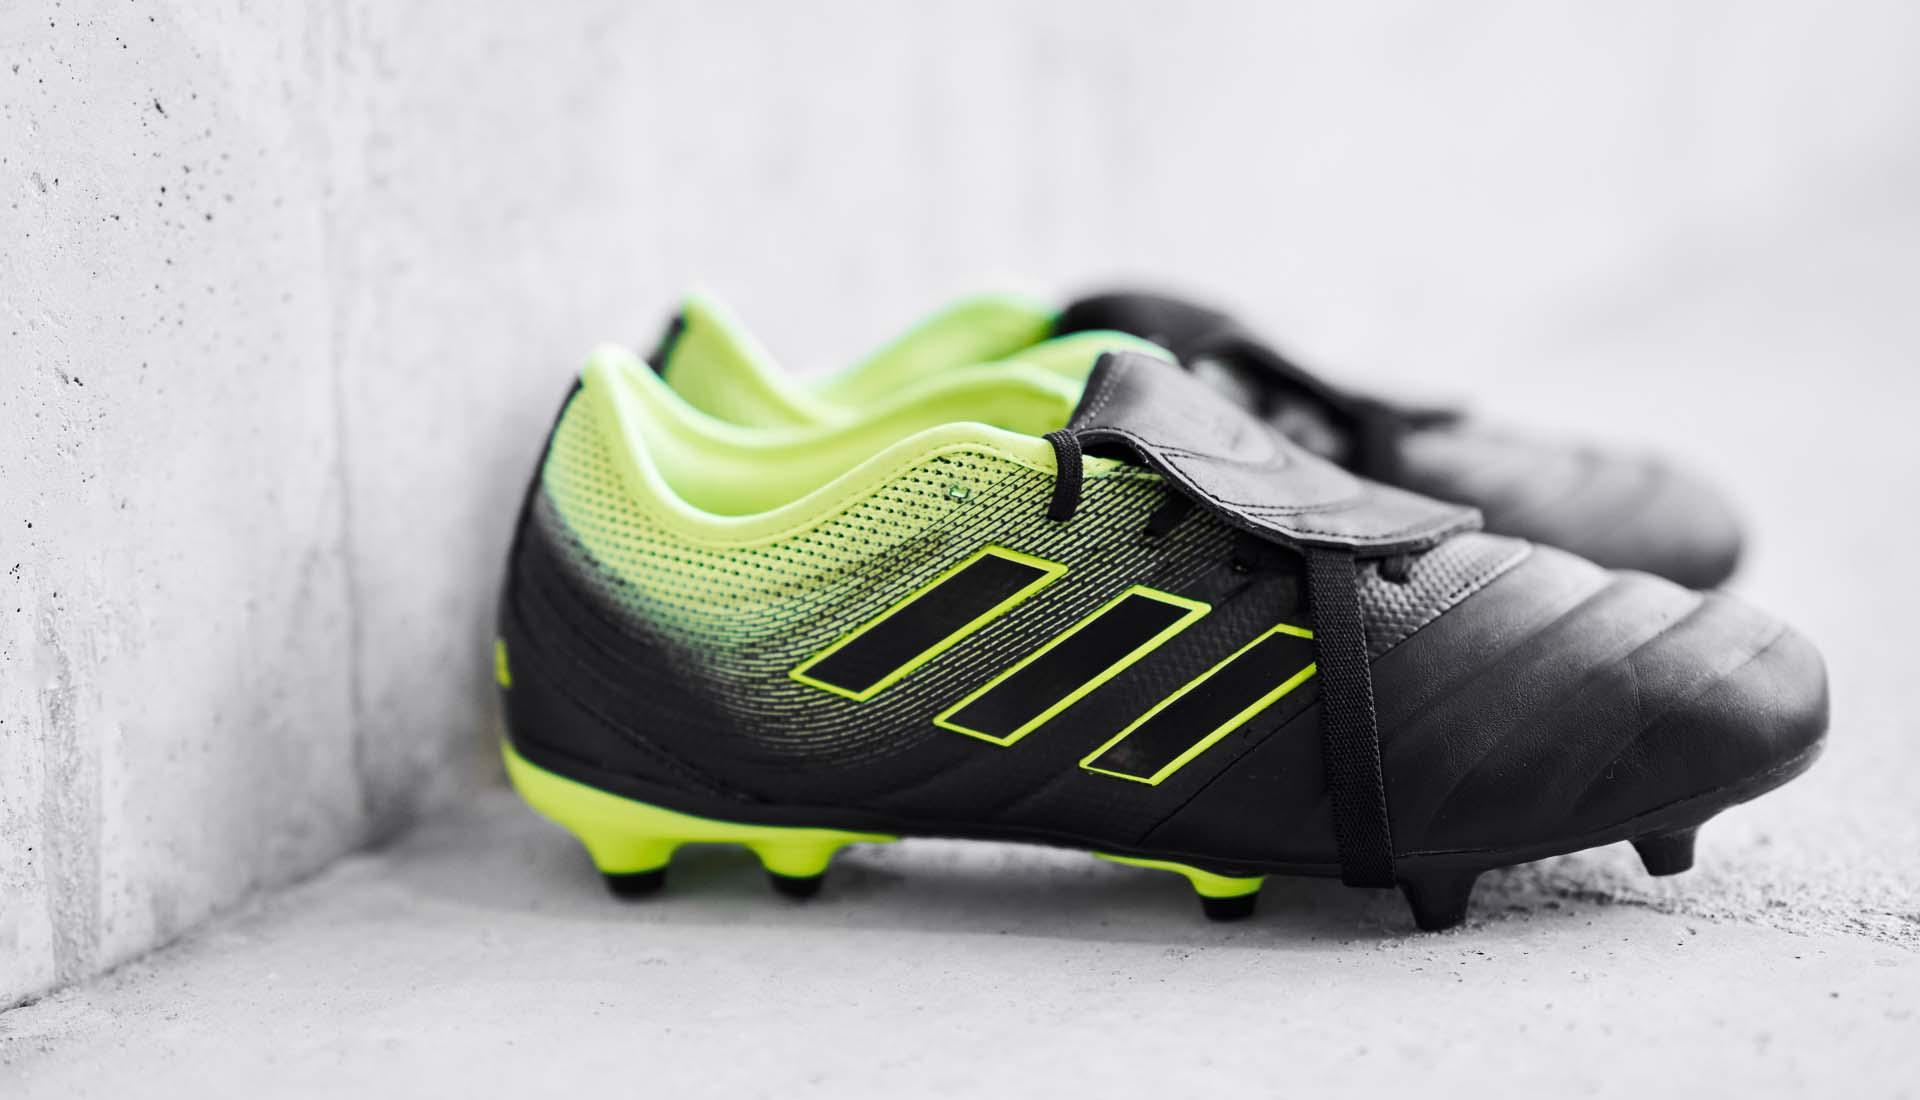 fa3be2ac3 adidas Launch the Copa Gloro 19